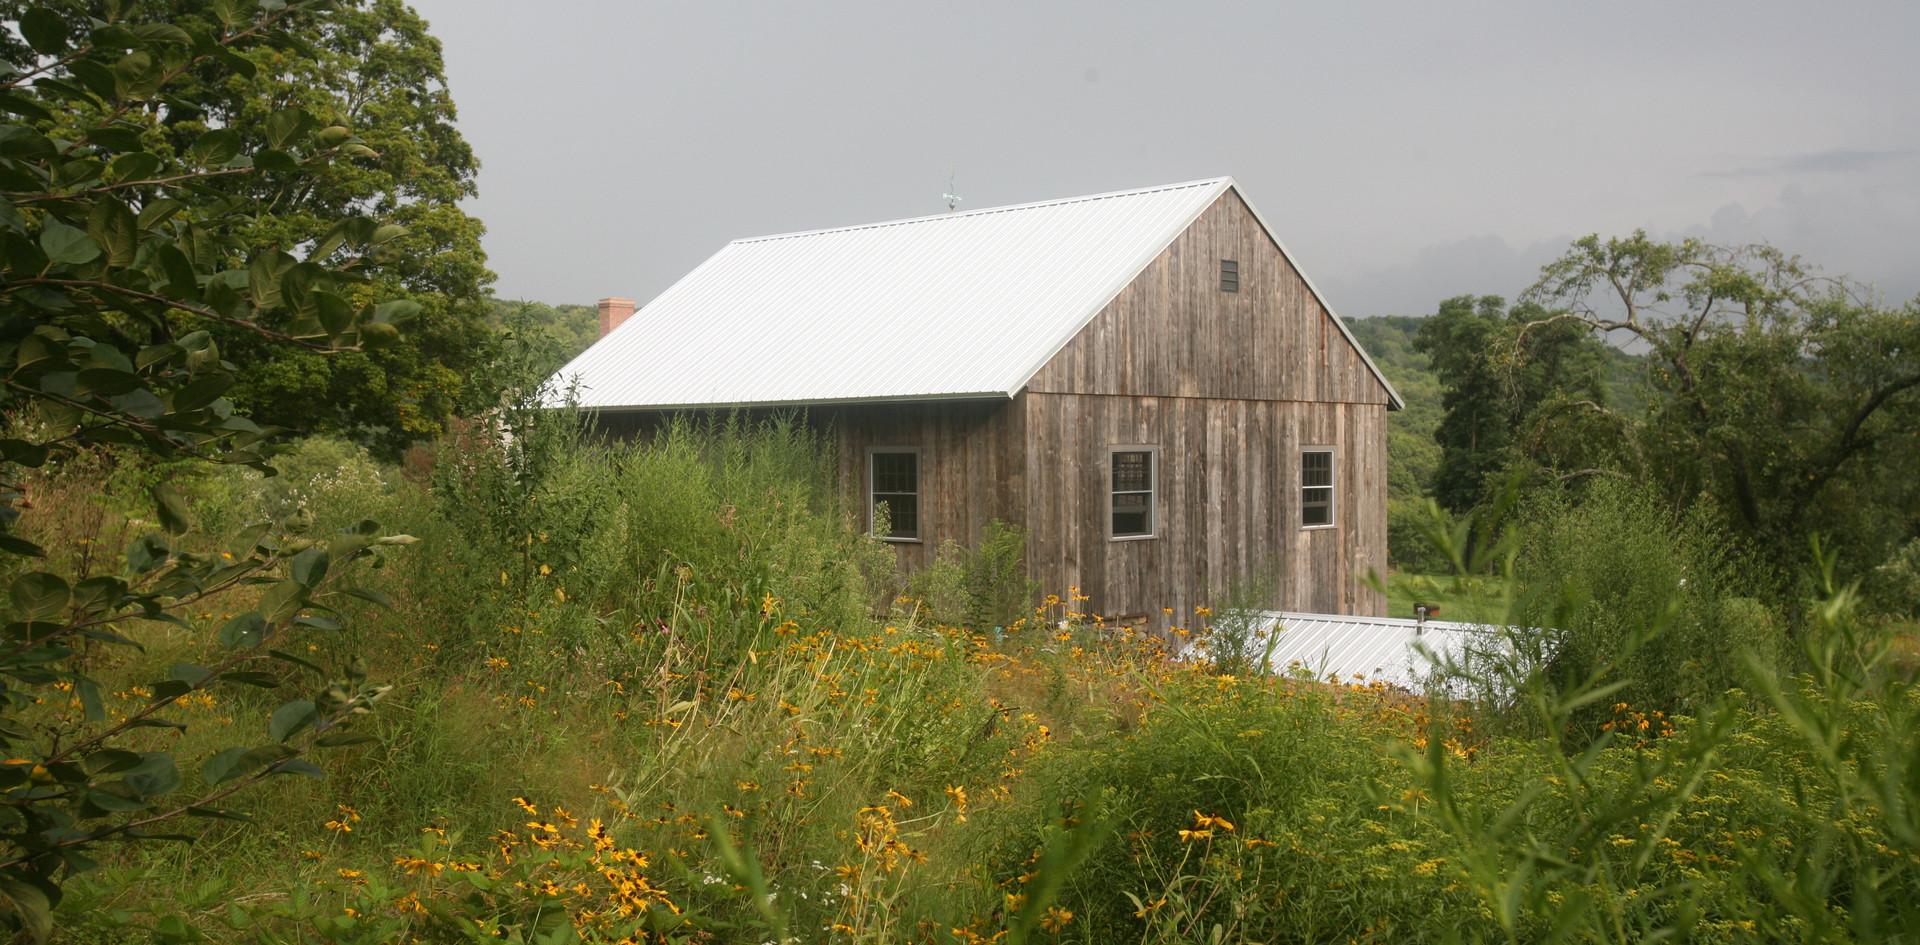 Holly Farms, Washington, Connecticut